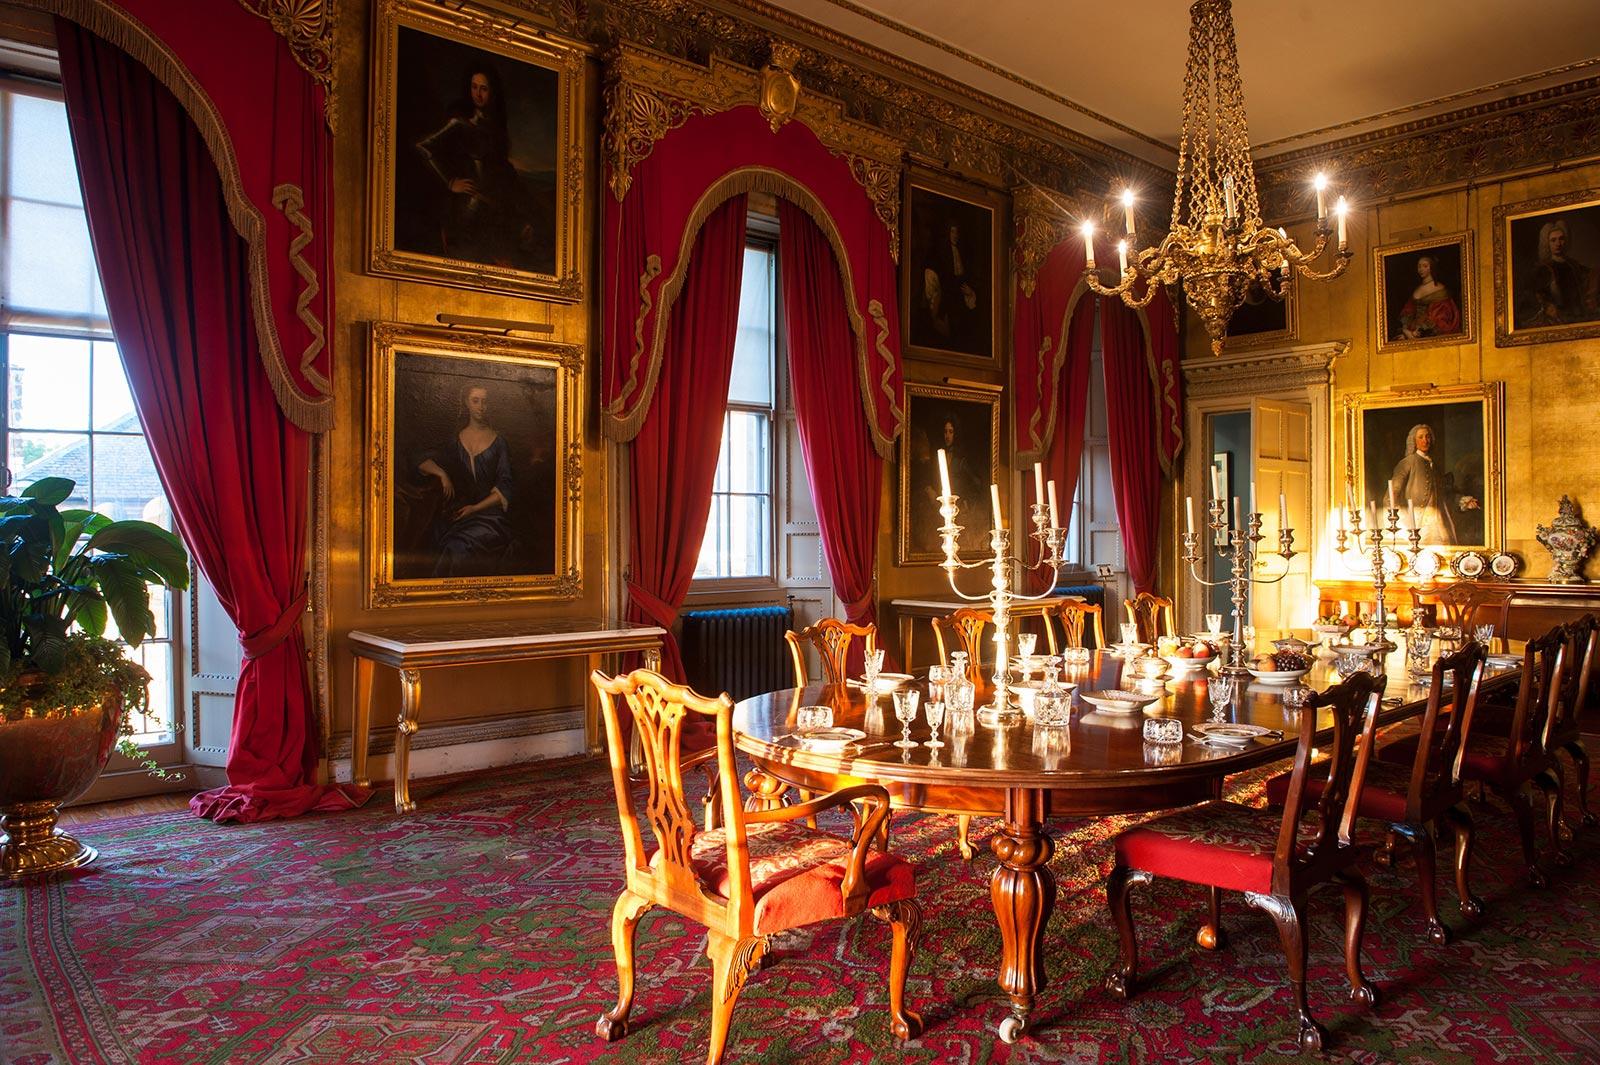 State dining room dinner